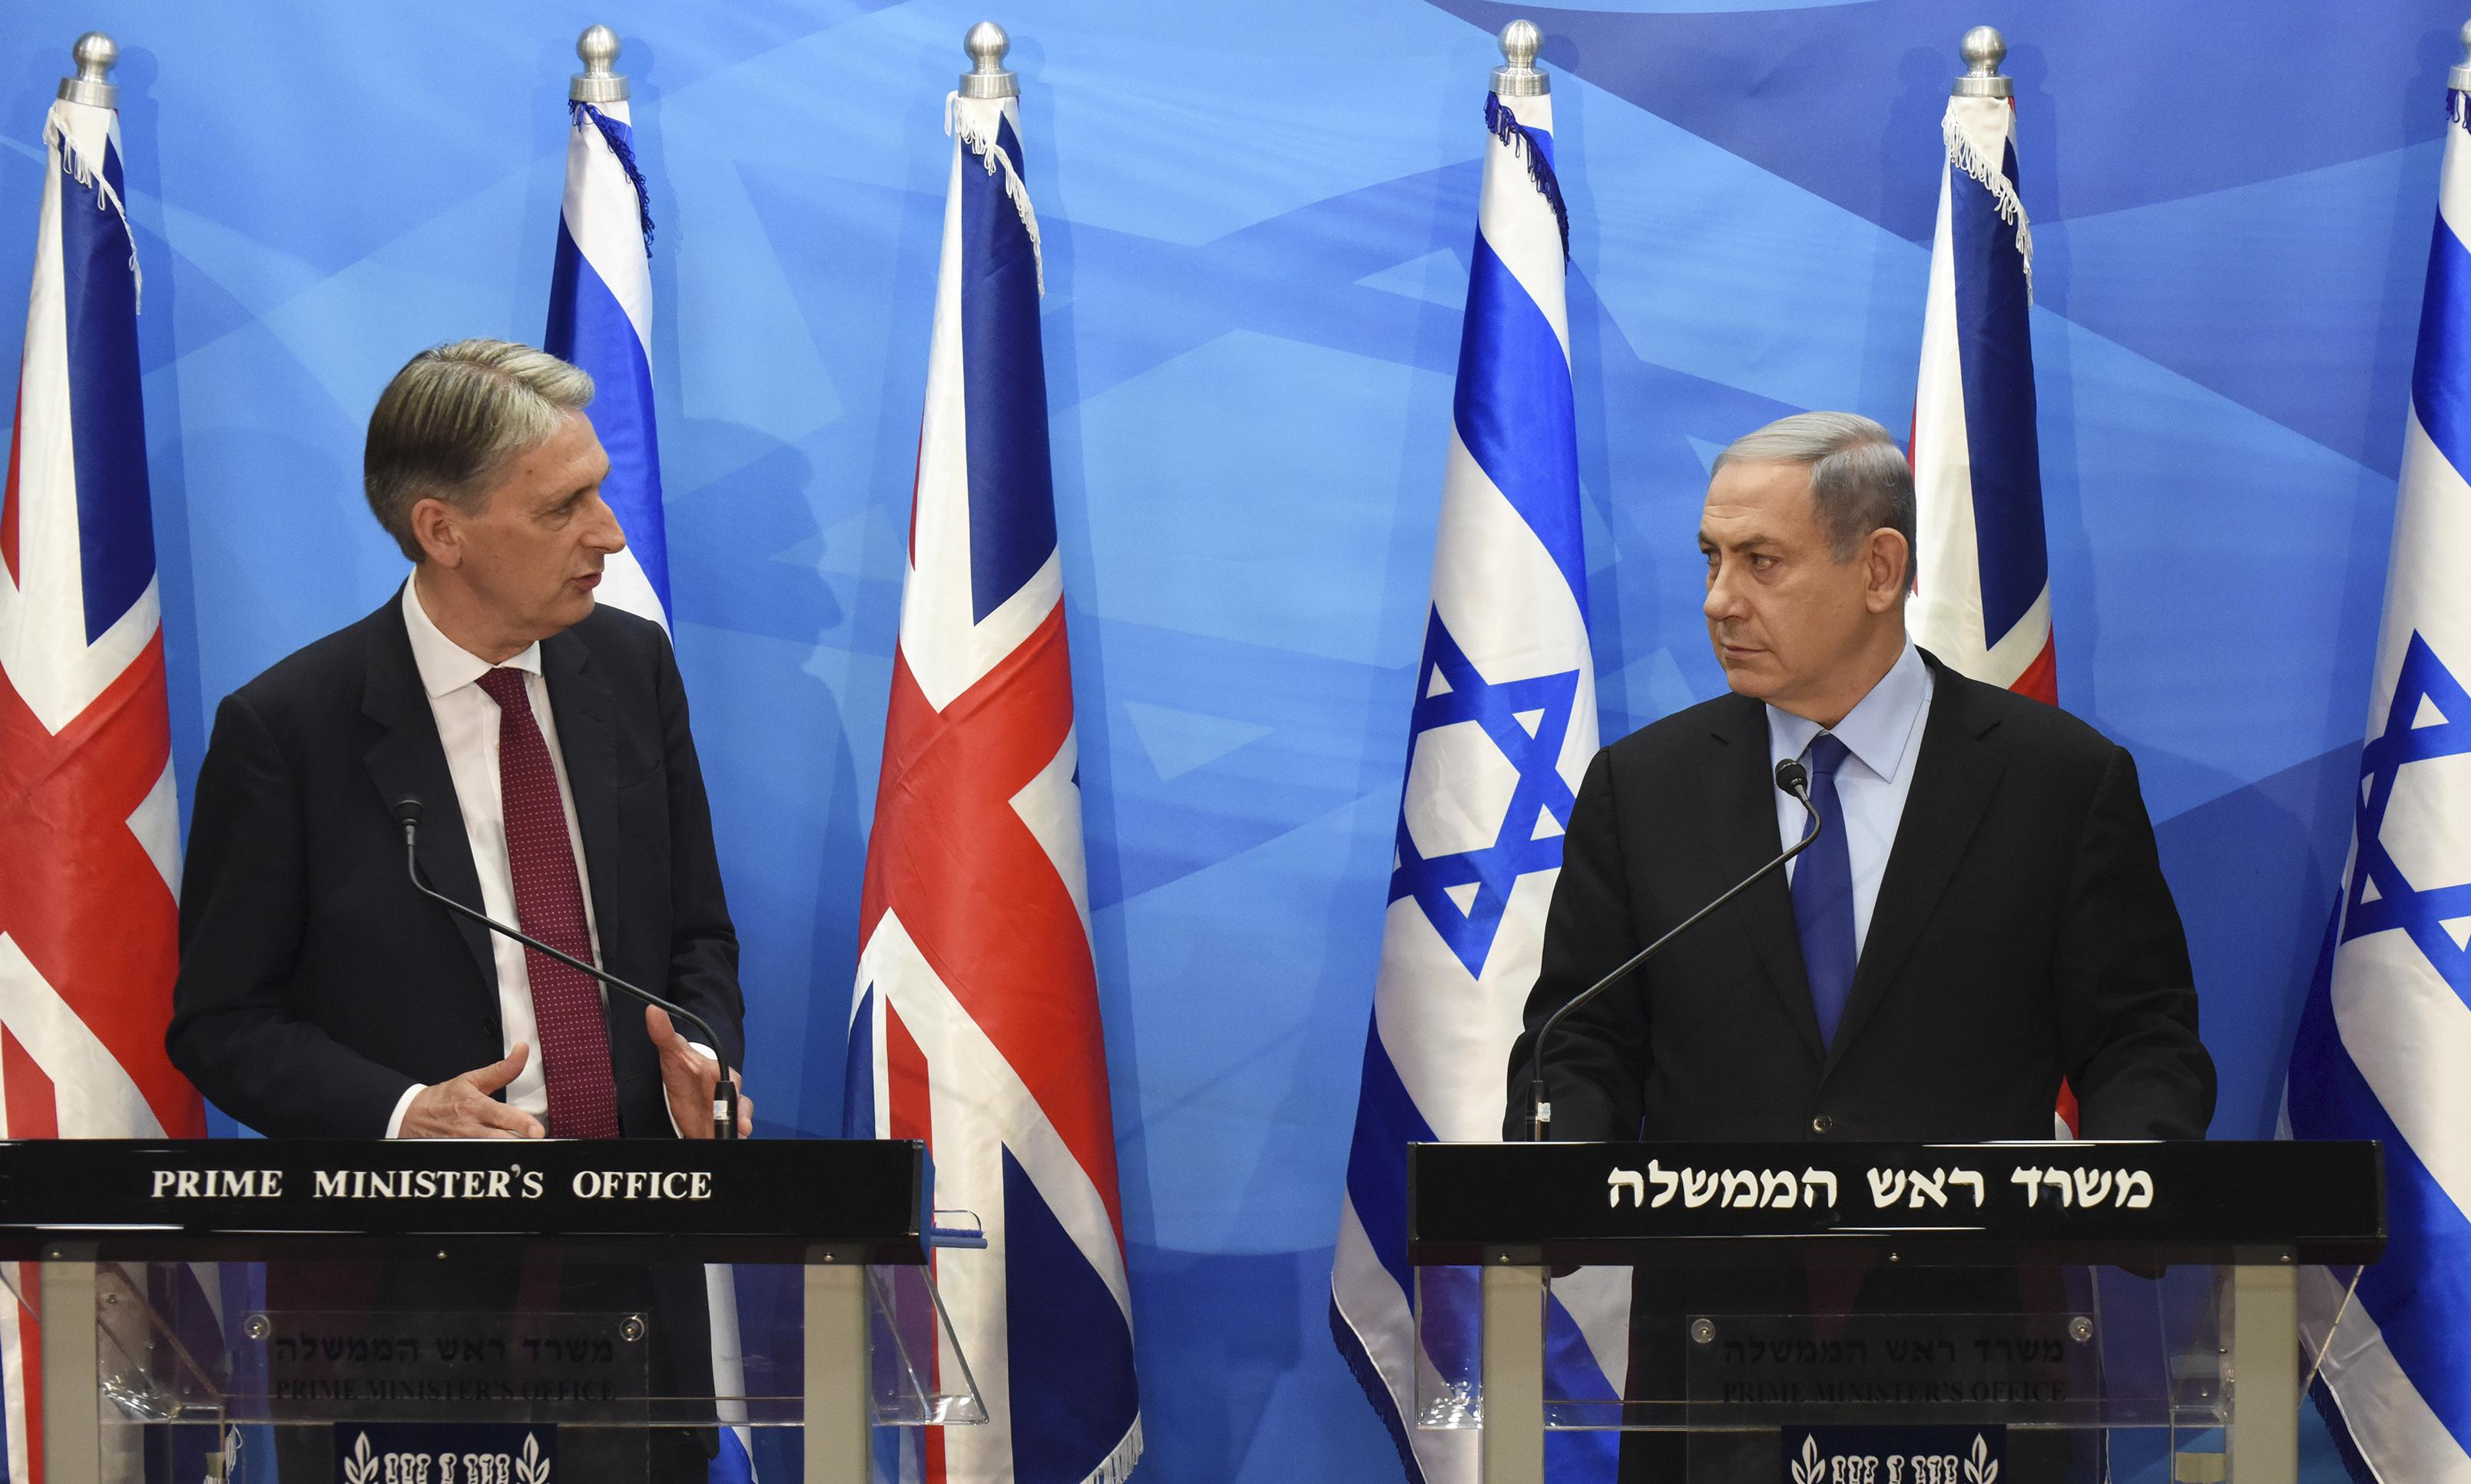 Netanyahu and Hammond spar over Iran nuclear agreement